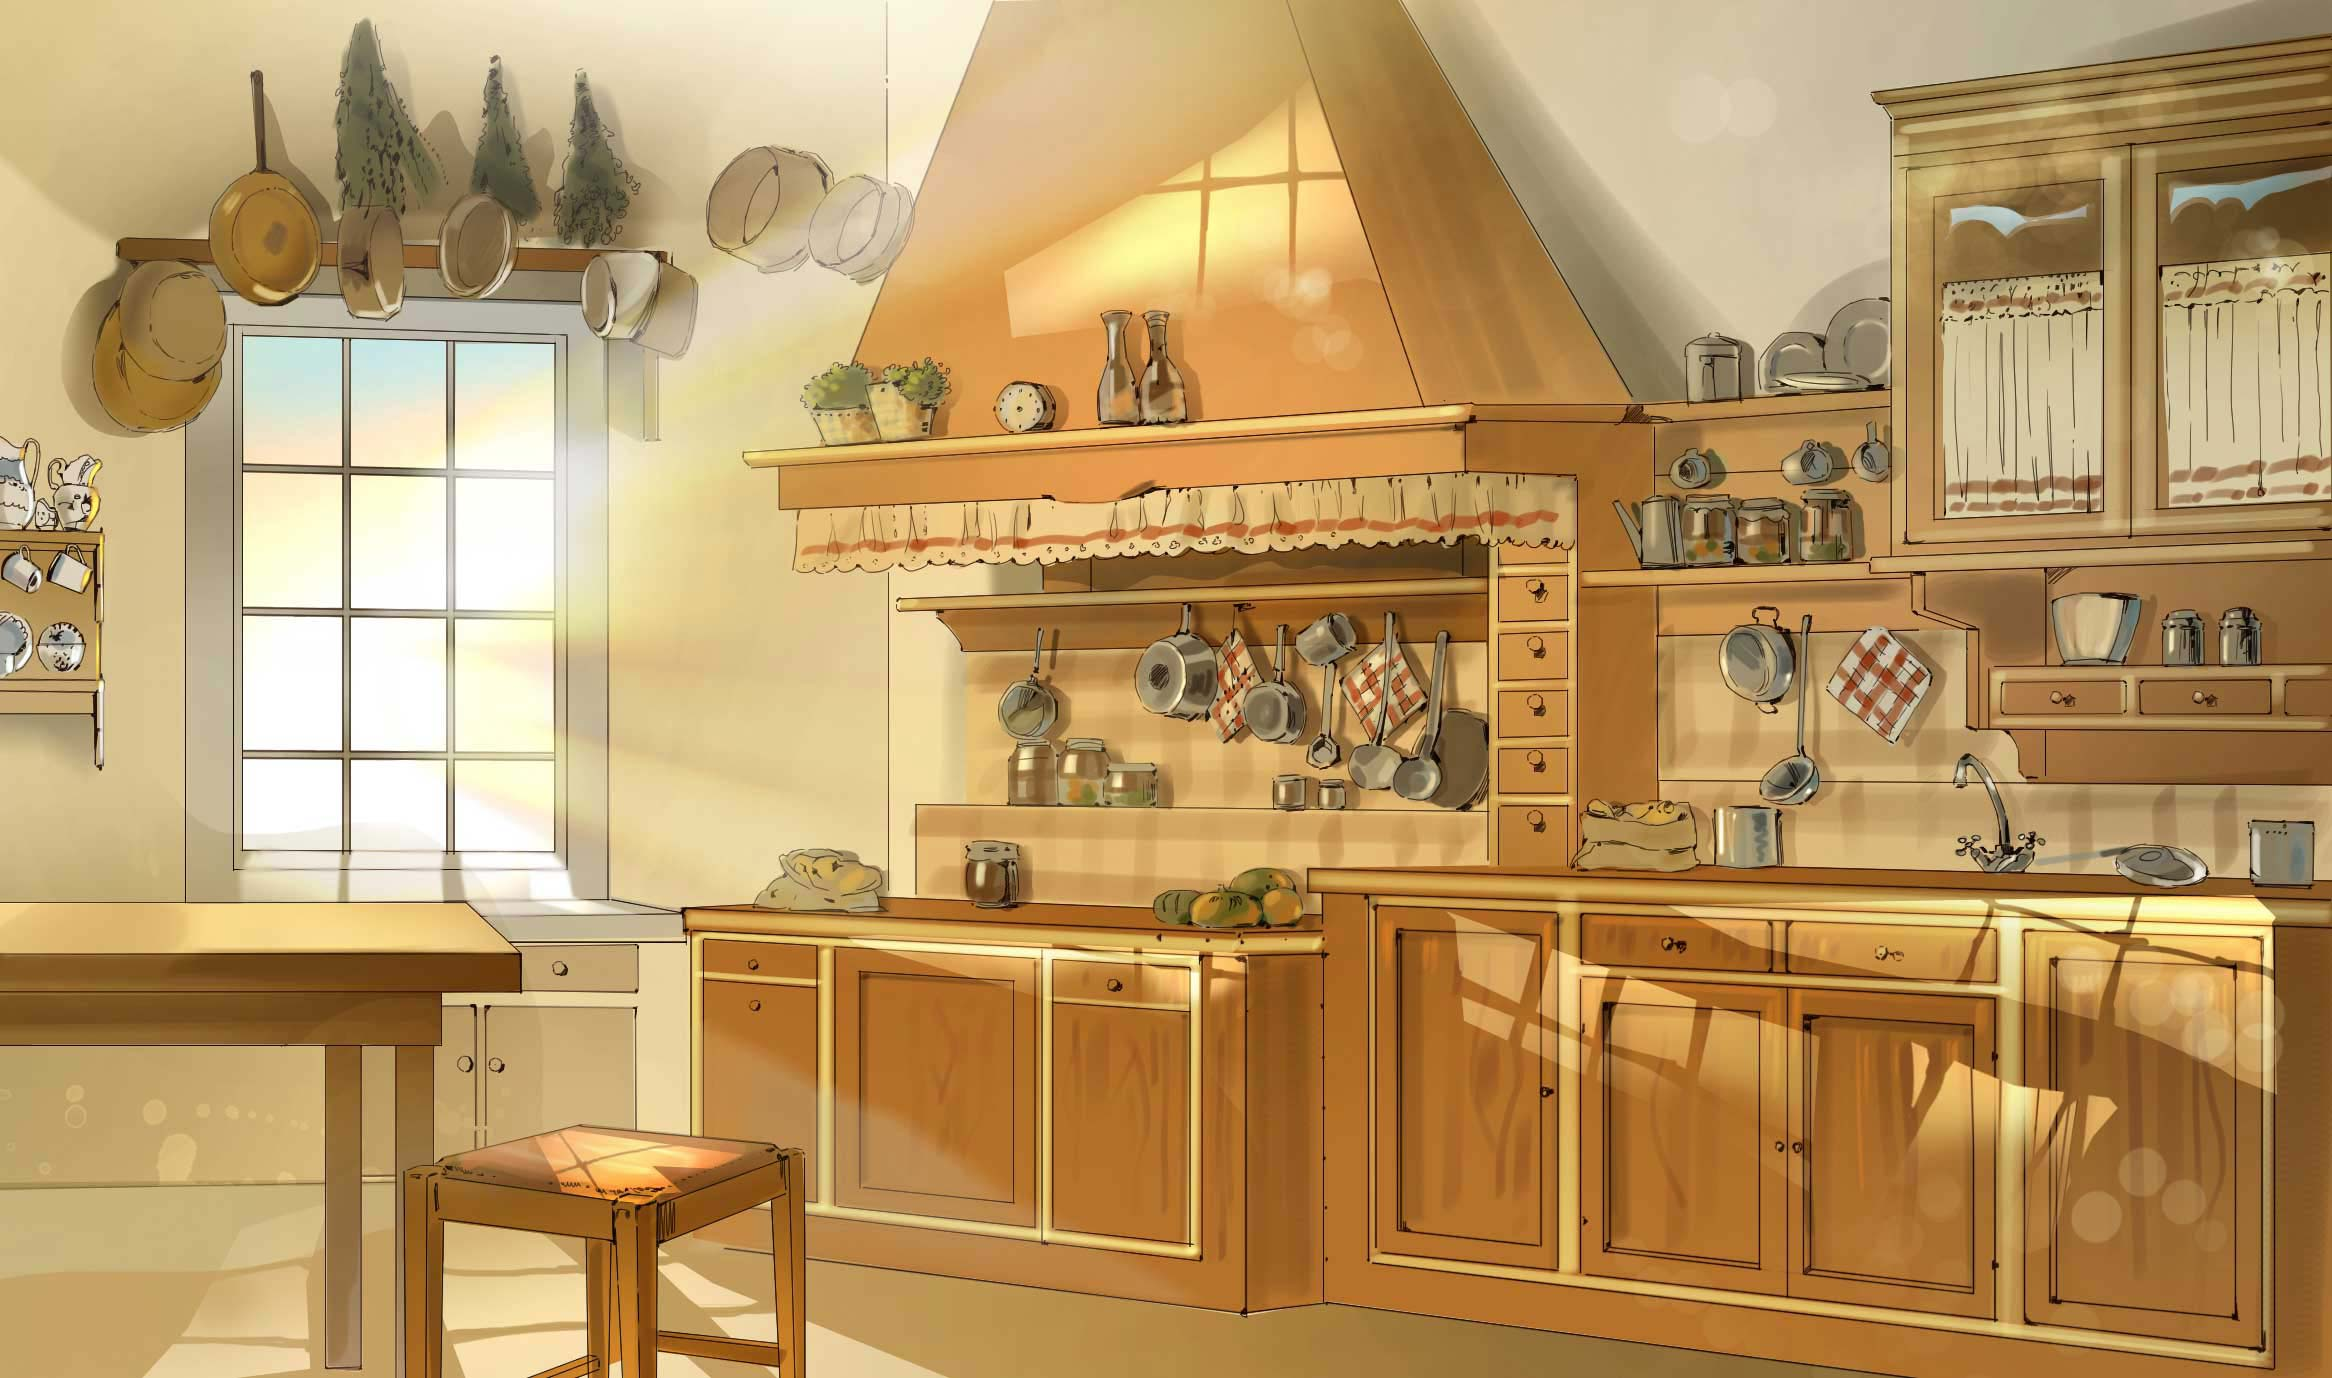 storyboard-visual-kitchen